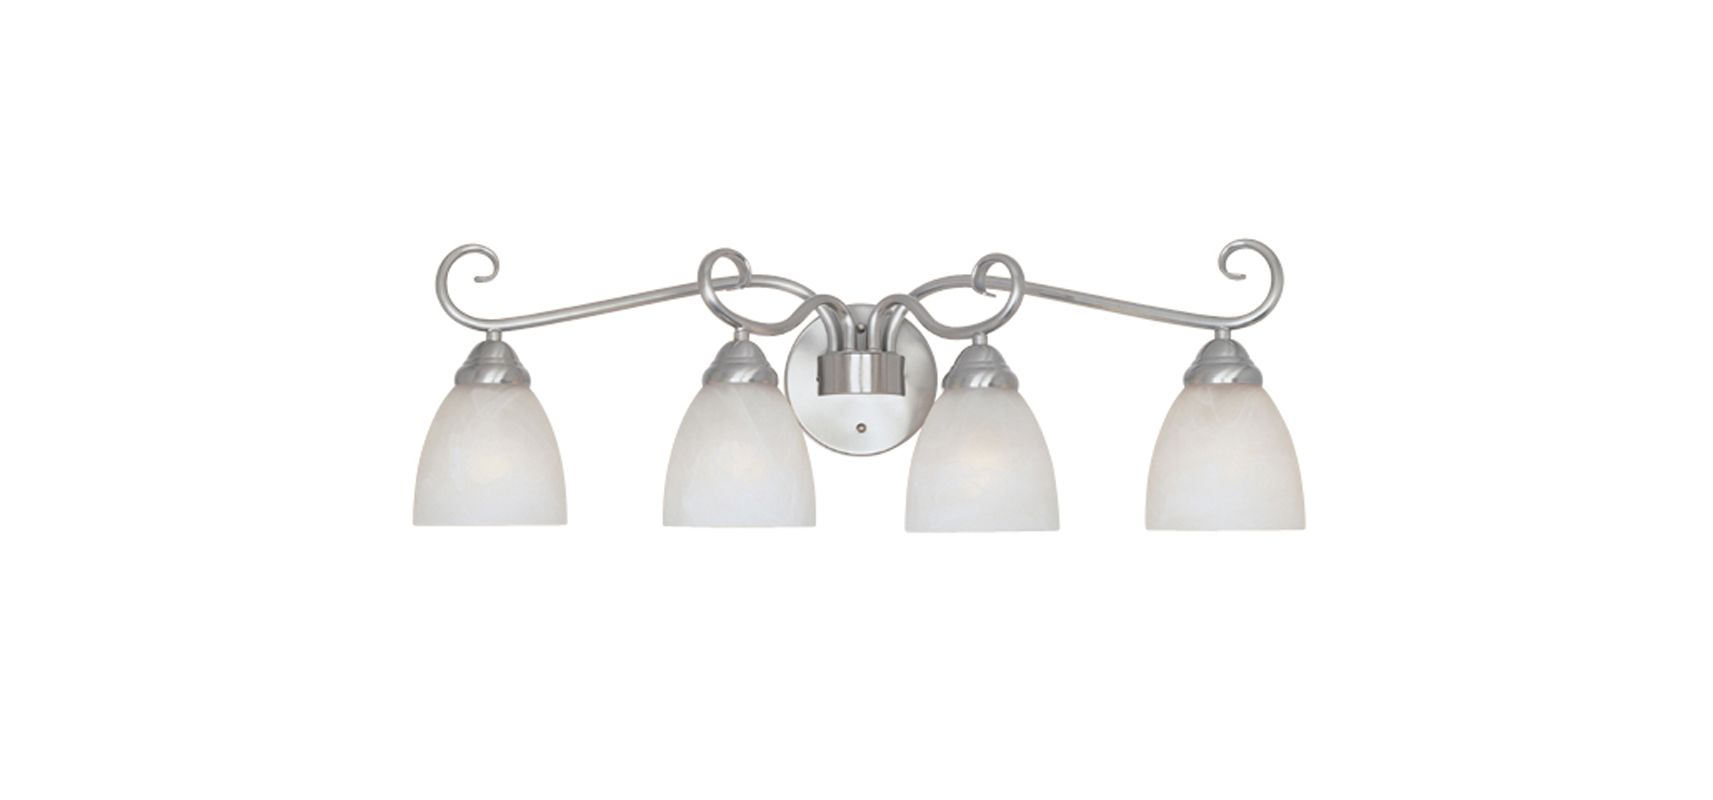 "Designers Fountain 98004 Four Light Down Lighting 29.75"" Wide Bathroom"